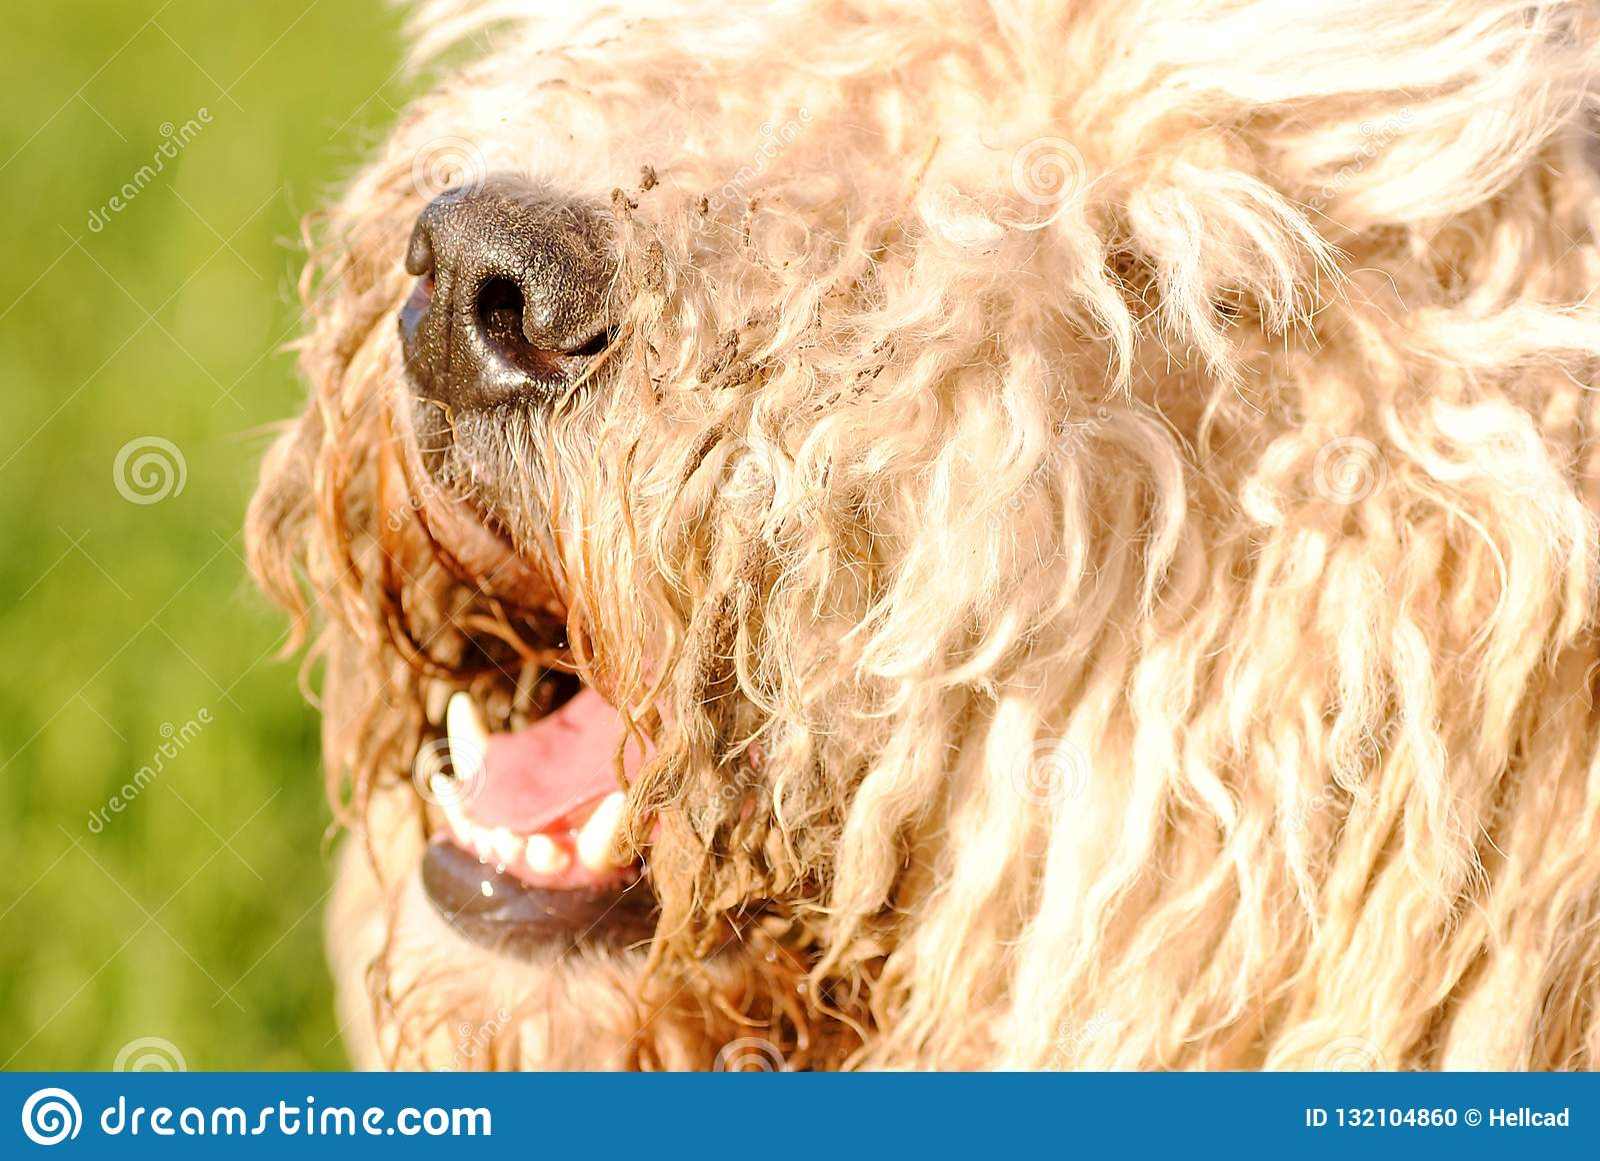 La nariz de perro melenuda grande